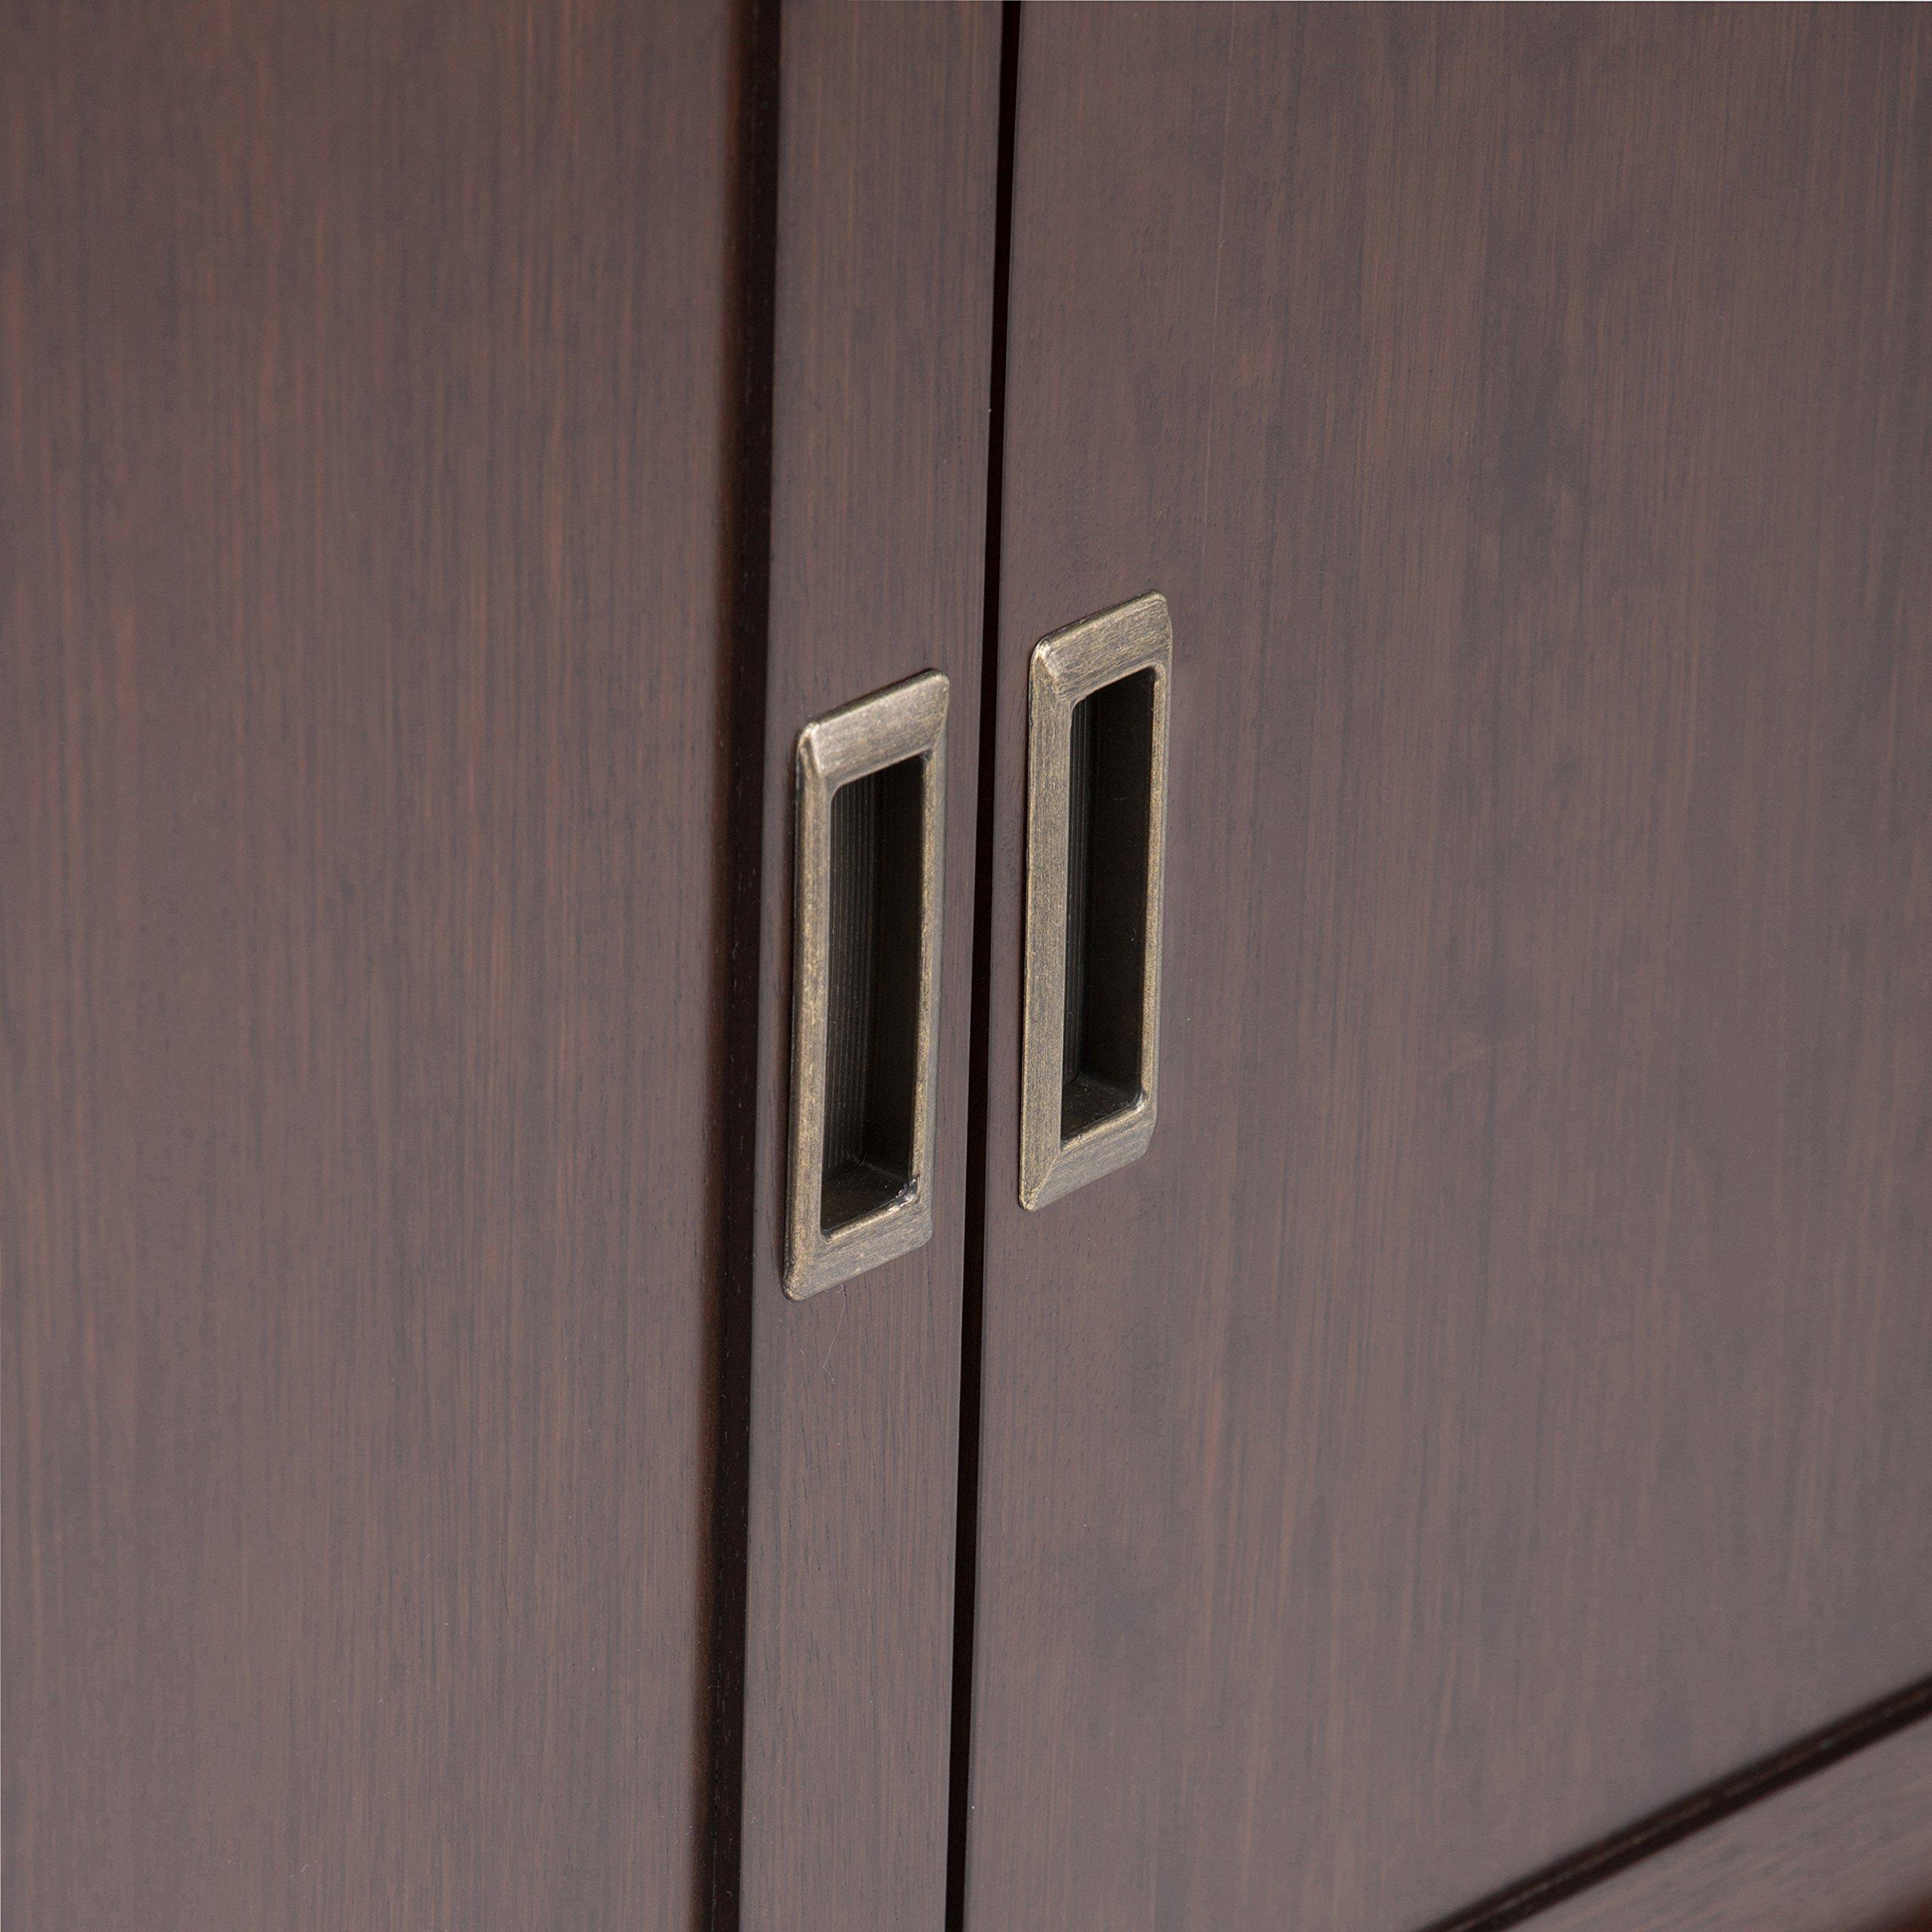 Simpli Home Draper Mid Century Solid Hardwood Storage Cabinet, Medium, Auburn Brown by Simpli Home (Image #4)